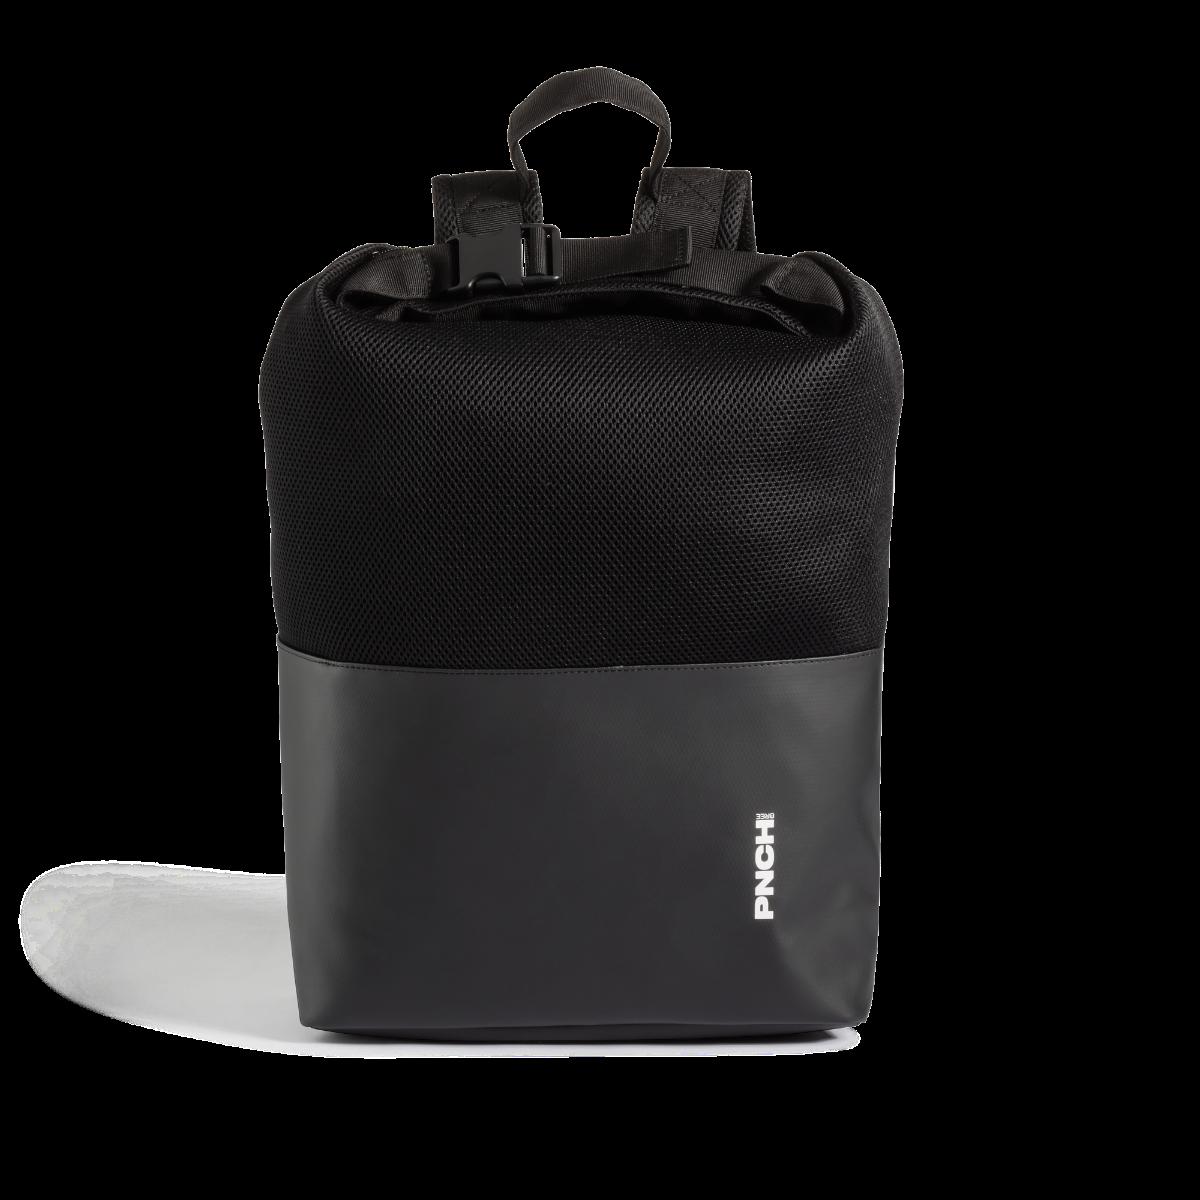 Rucksack 16.5 Liter PNCH Air 7 - Black - Pouch Backpack